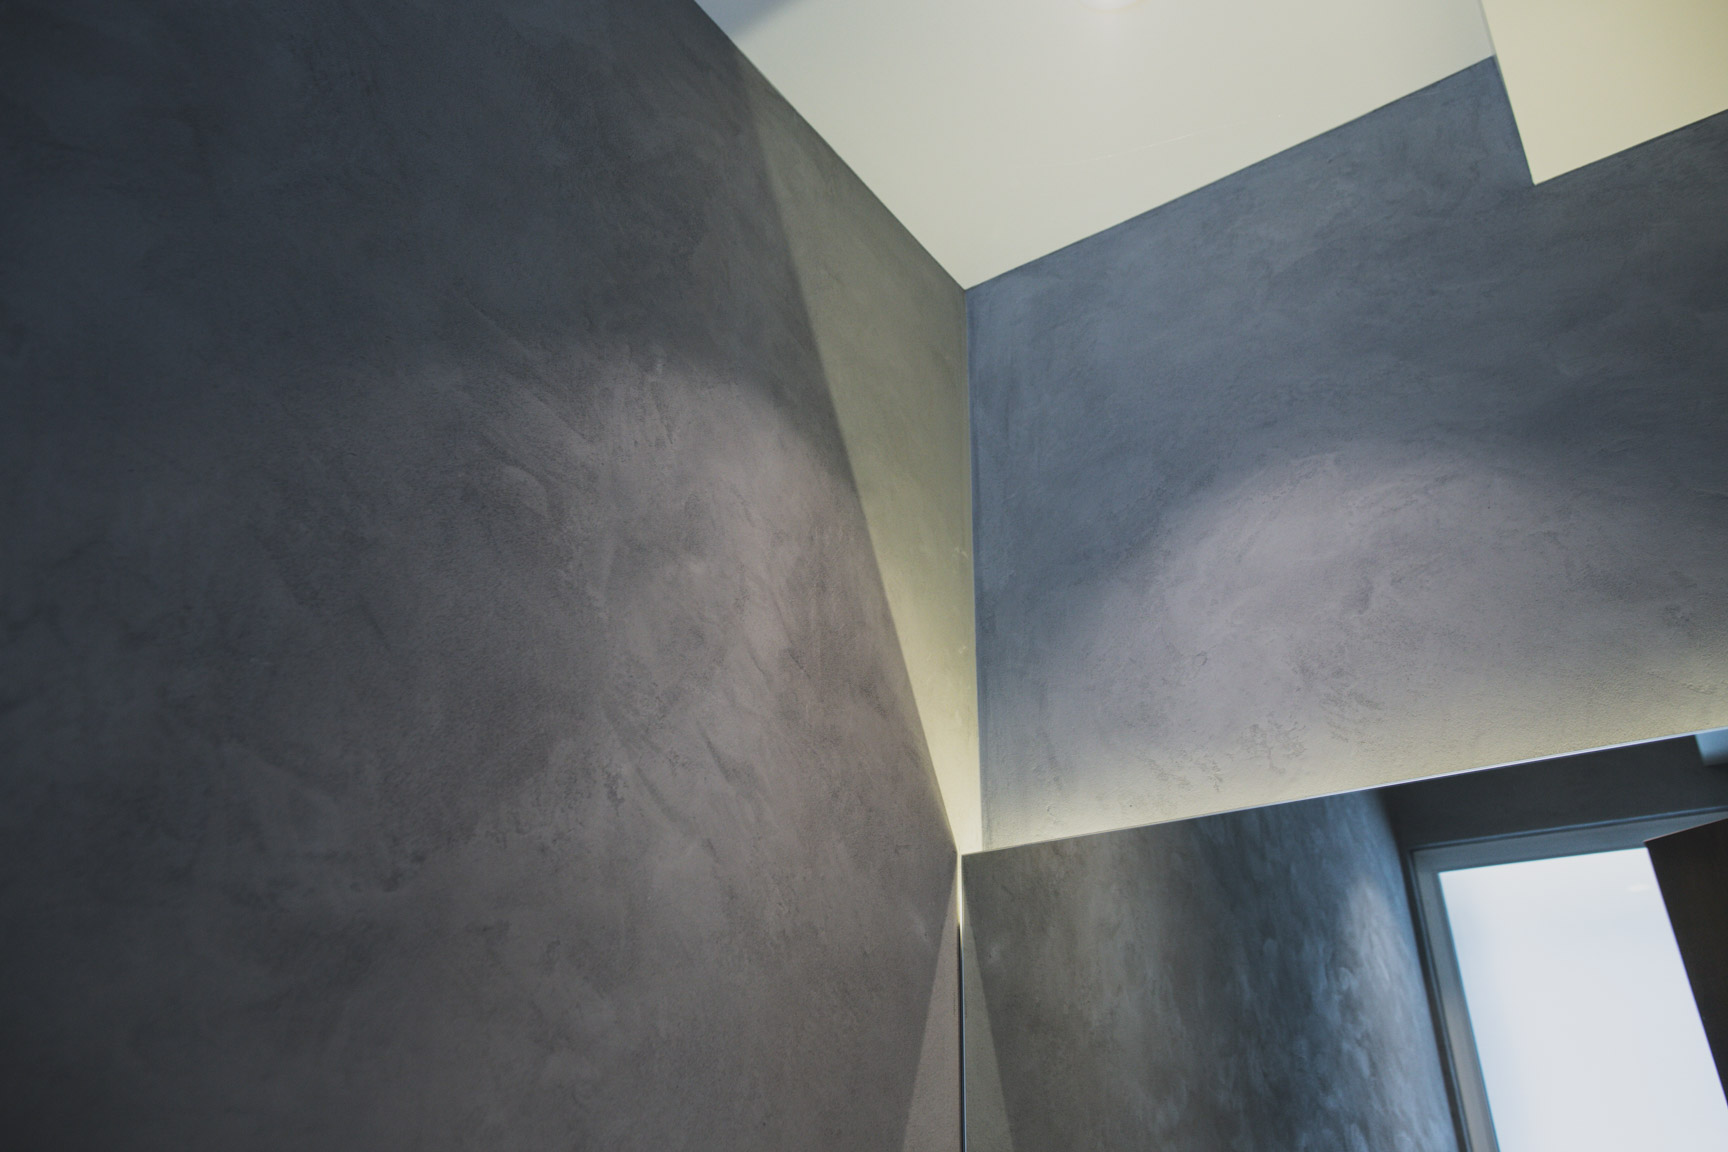 surfacedesign-23.jpg